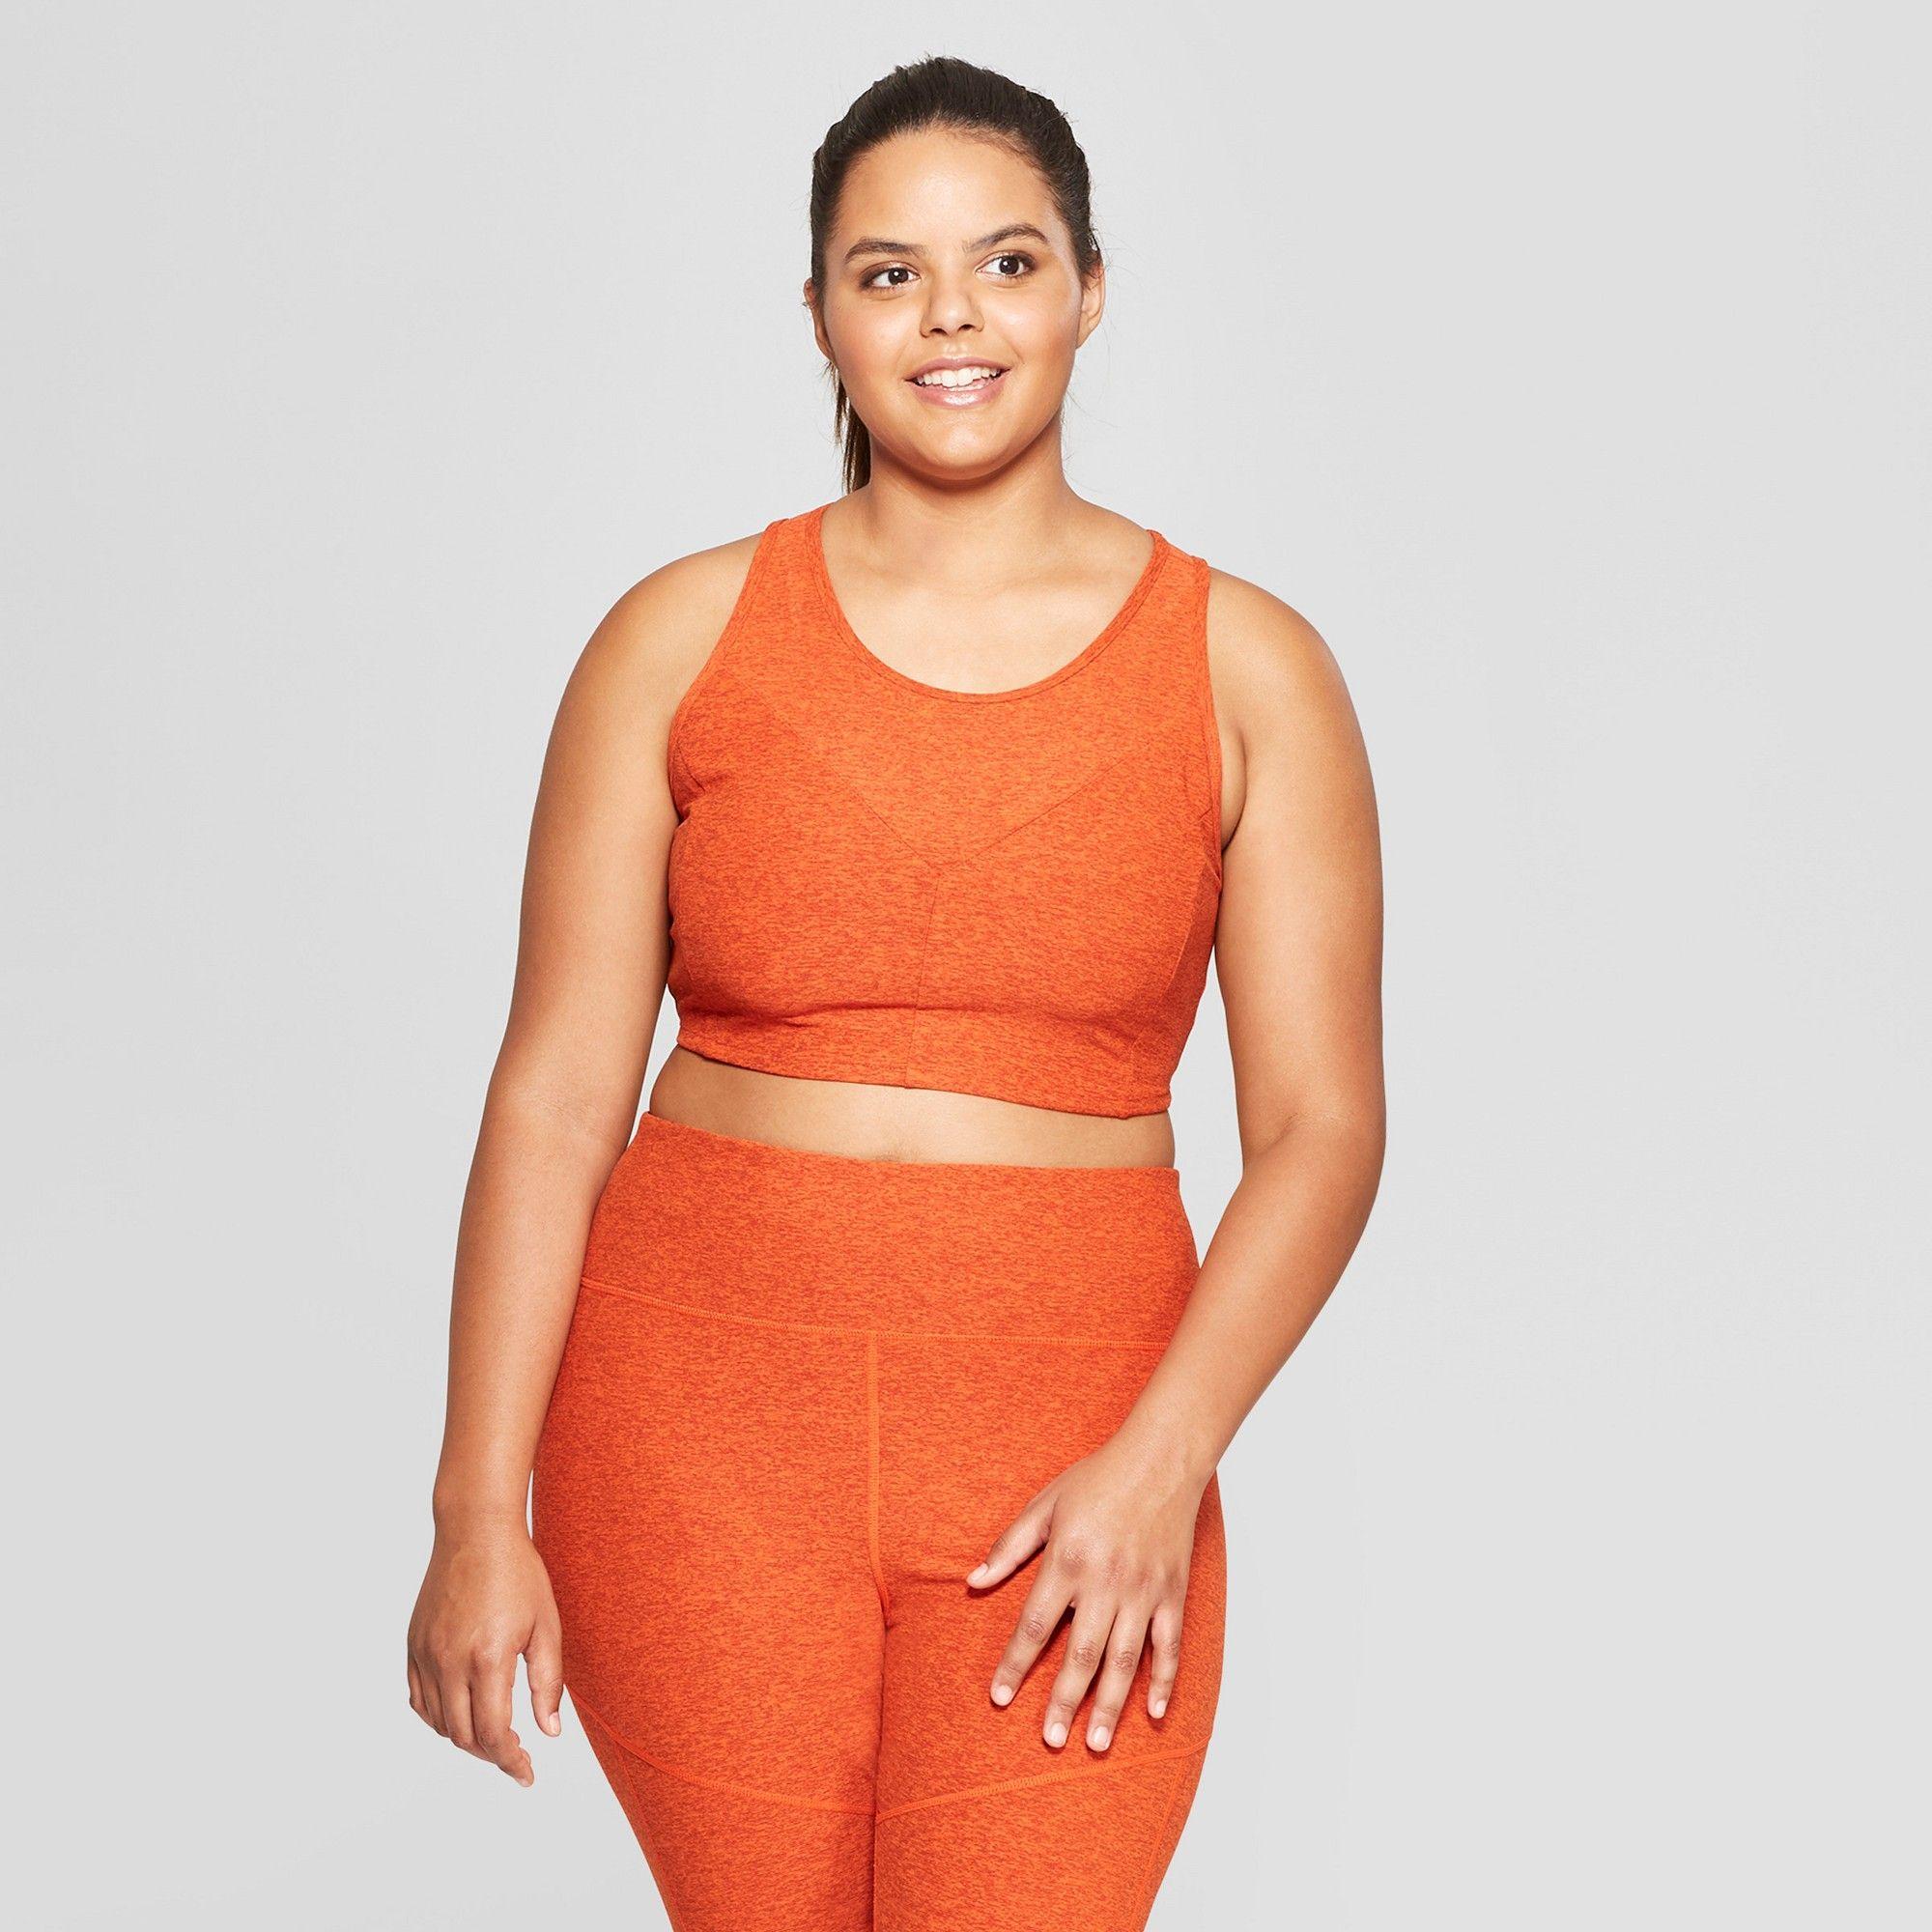 dbf9e5c700358 Women s Plus Size Longline Sports Bra - JoyLab Pumpkin Orange4X ...